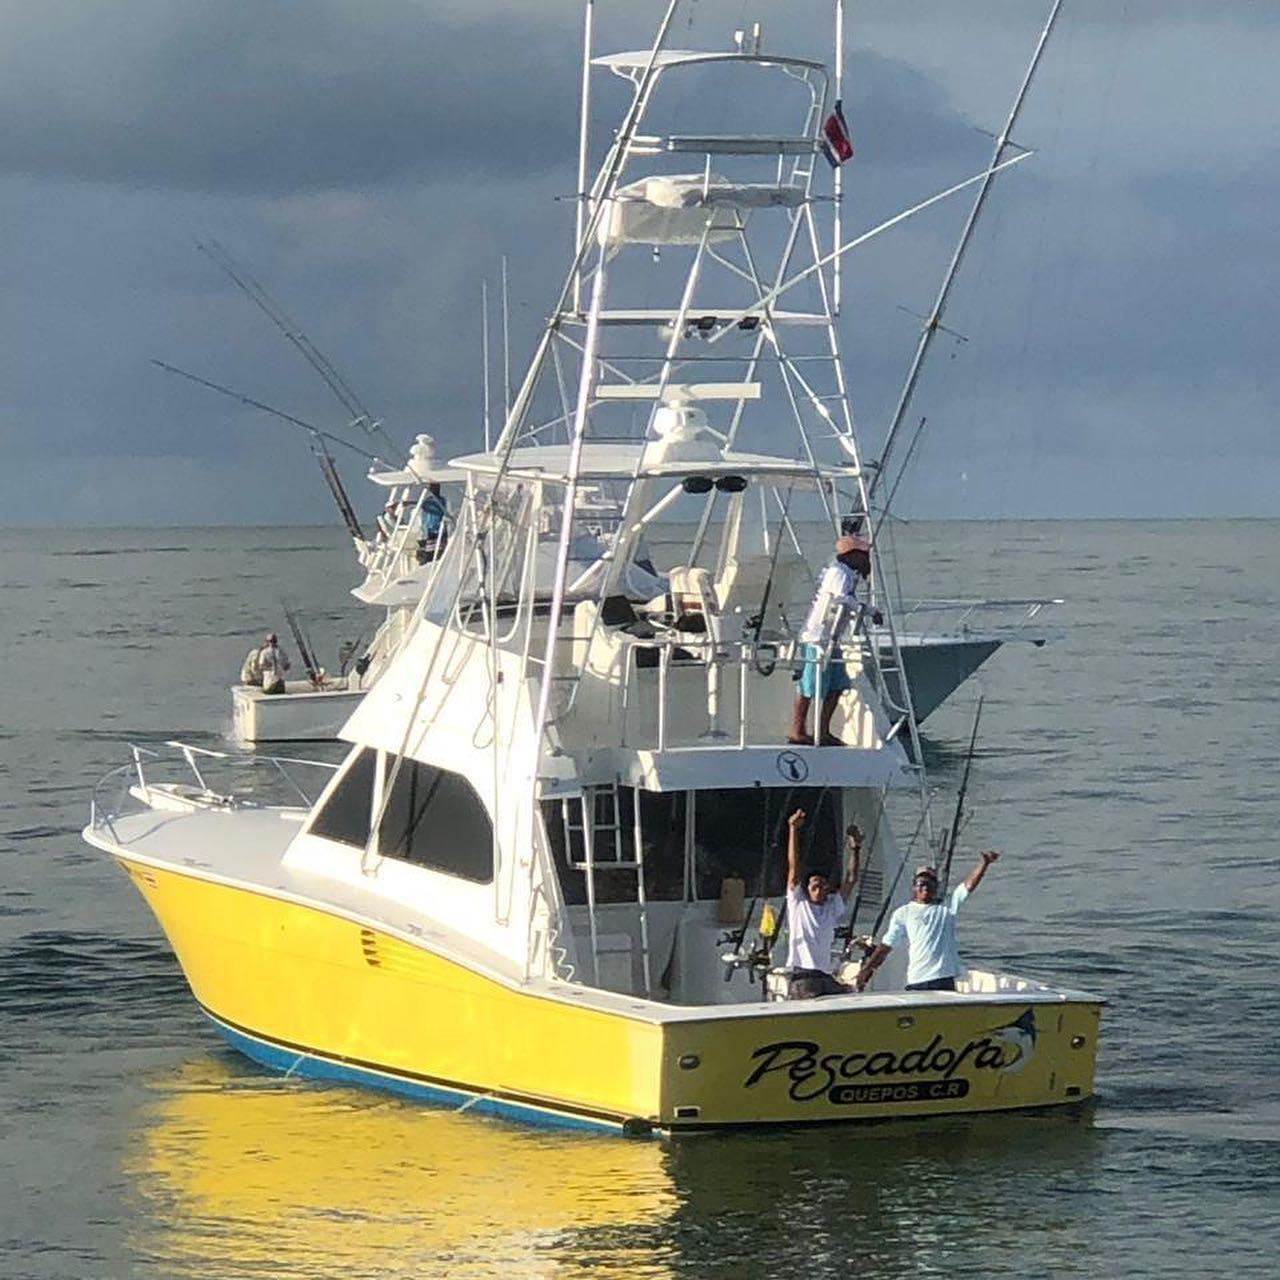 pescadora2